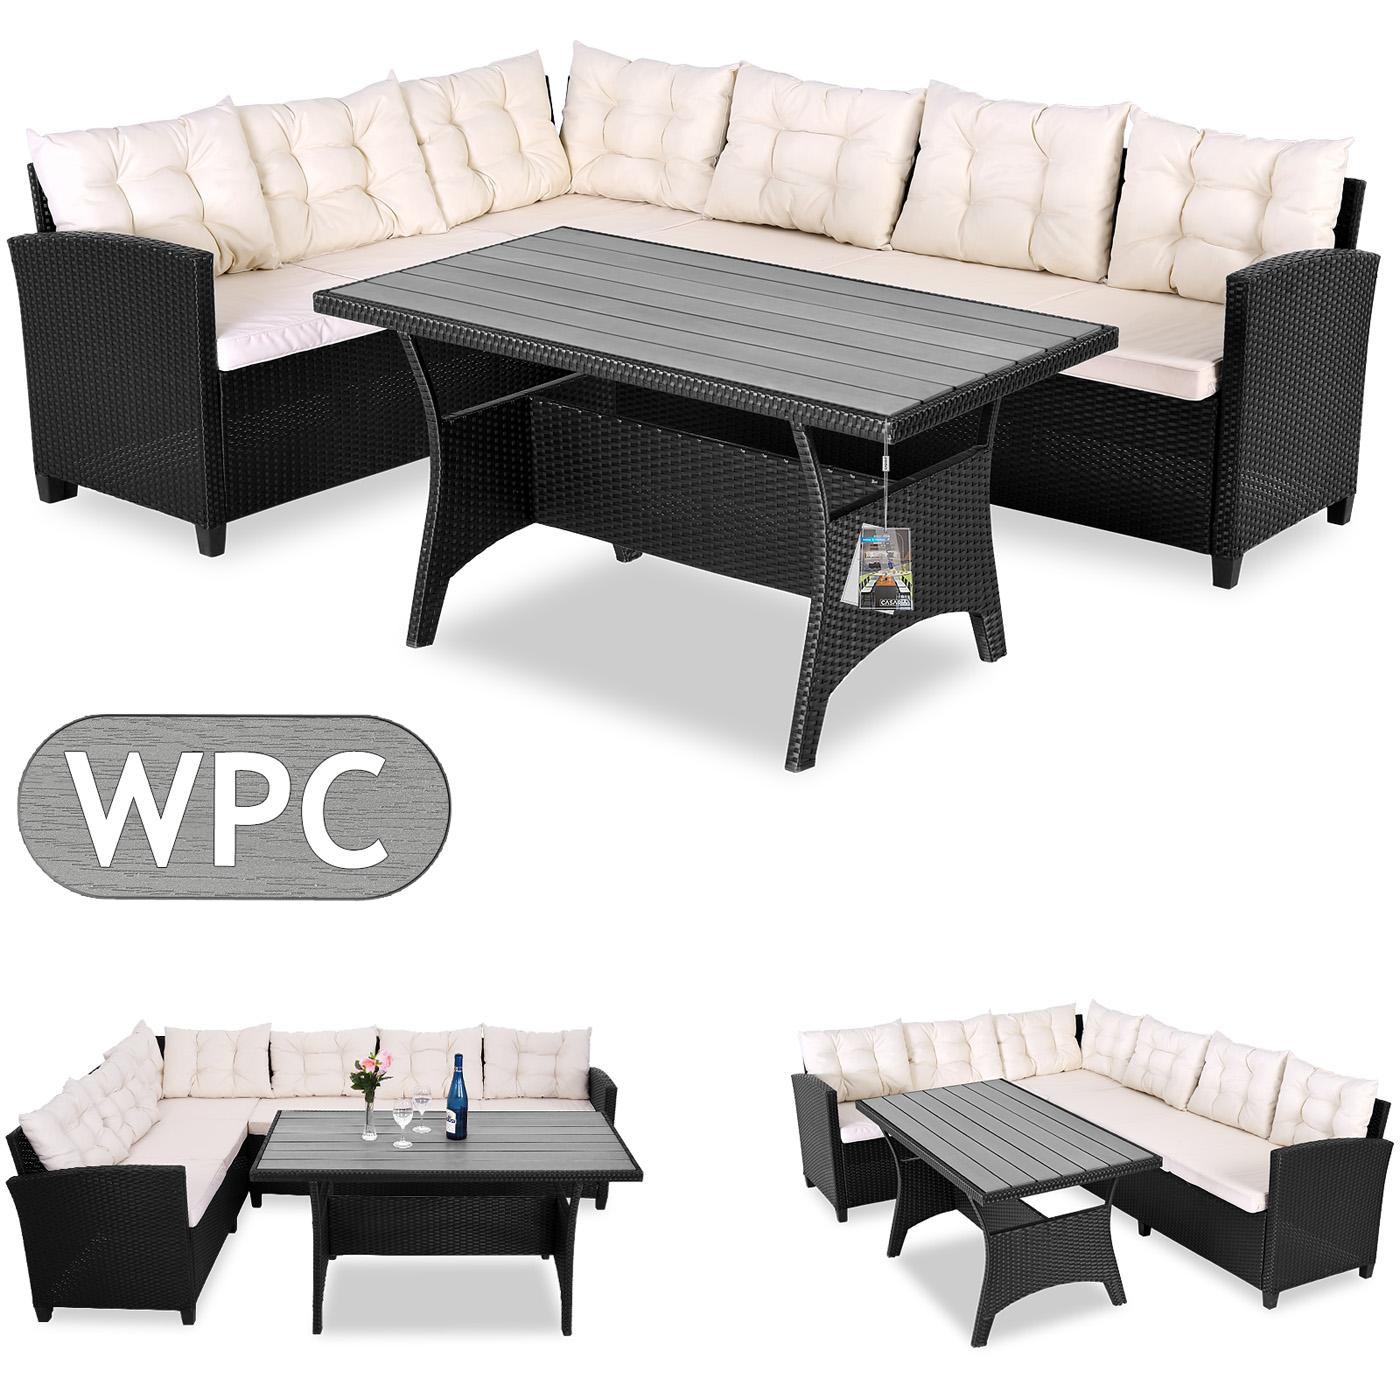 Deuba Poly Rattan Corner Sofa Set WPC Table Black Outdoor Garden ...